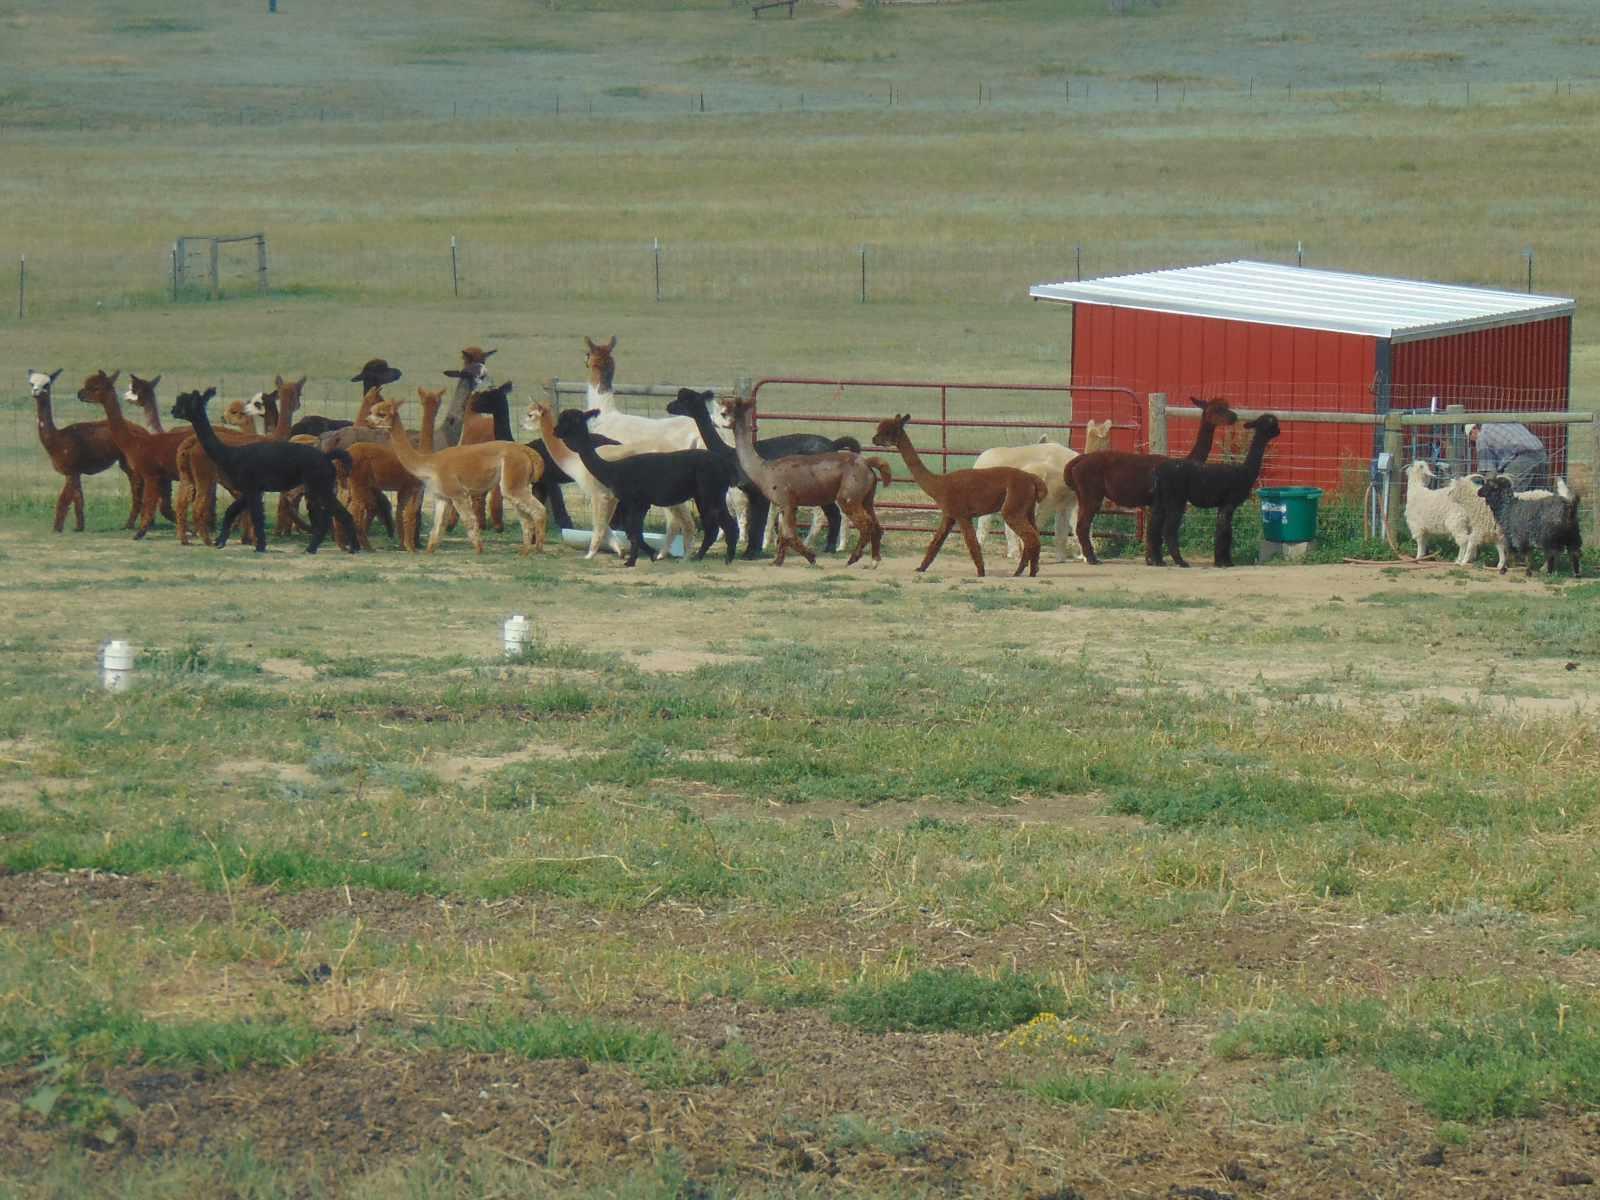 Alpacas, Llamas & Angora goats